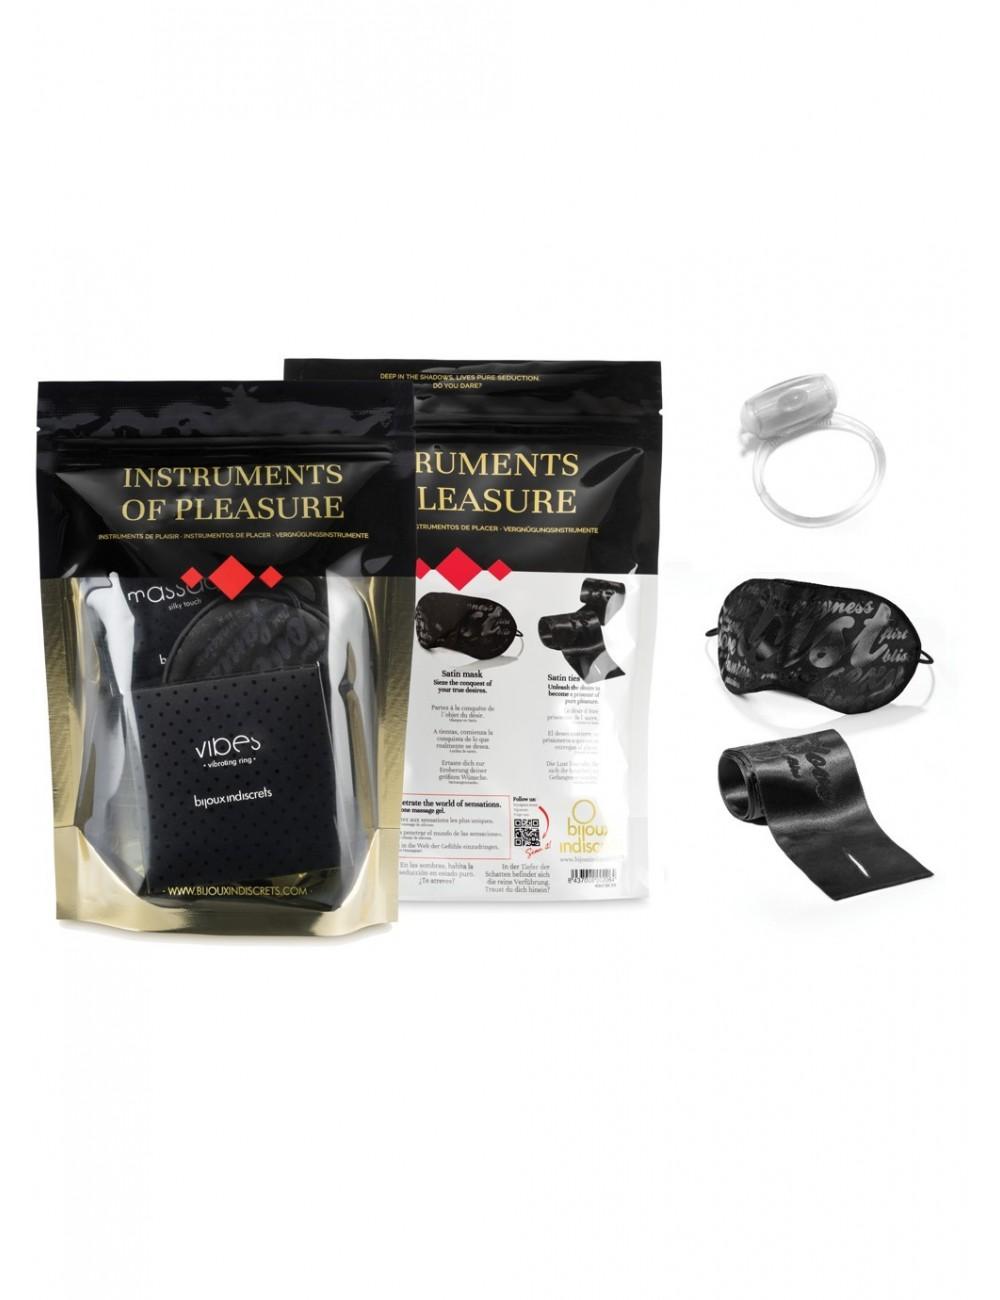 Coffret Kit Instruments of Pleasure - BI-3442 - Huiles de massage - Bijoux Indiscrets